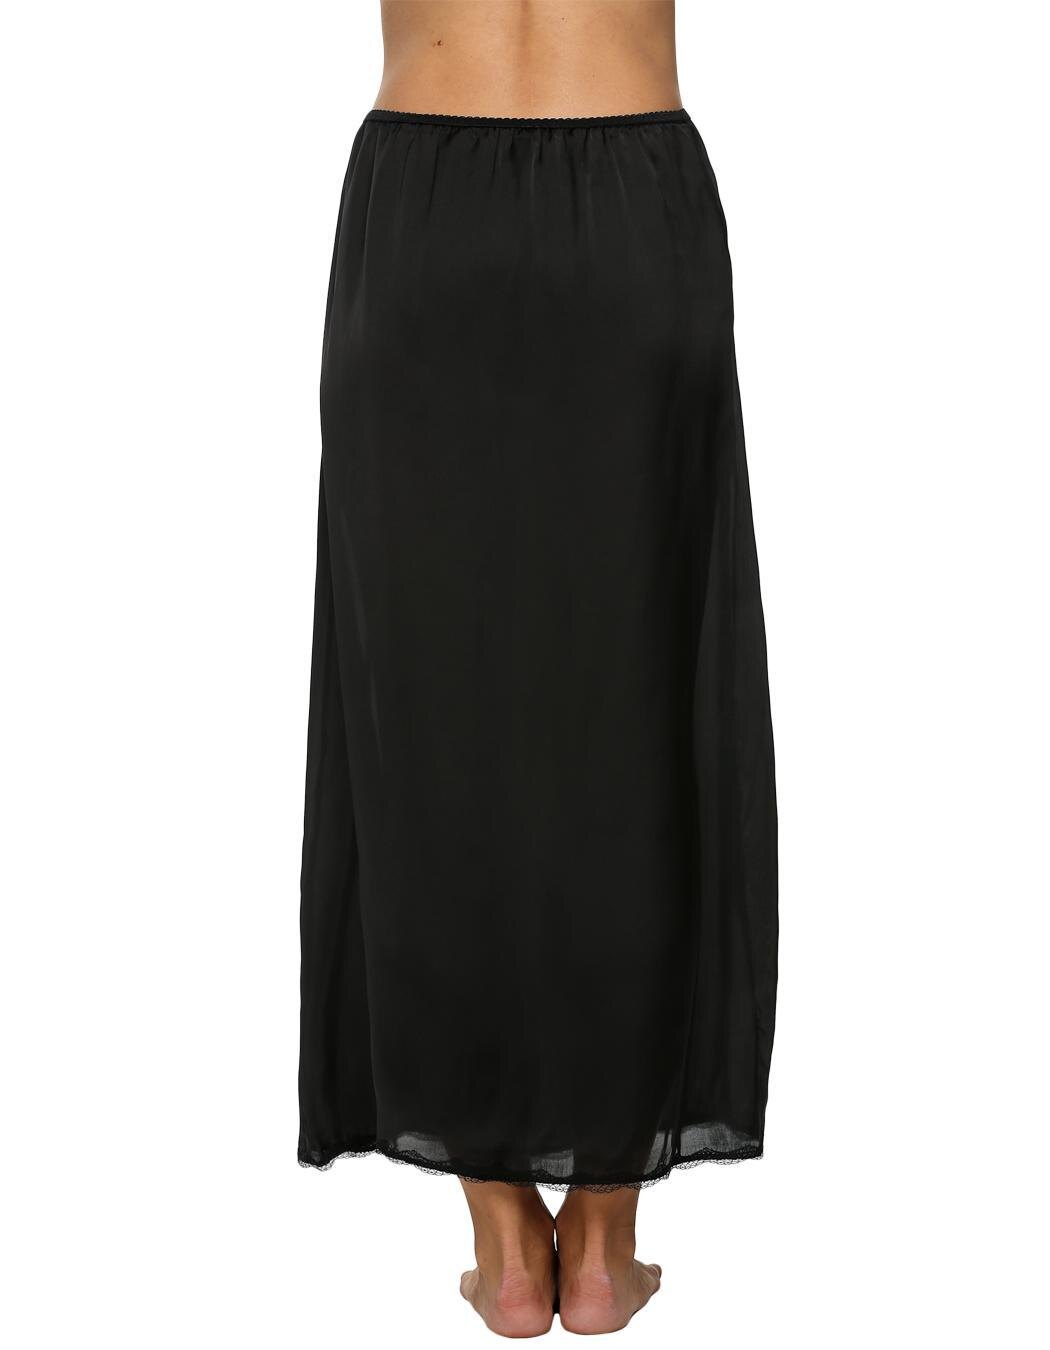 Women Satin Solid Lace Trim Maxi Half Slip Underskirt Slip Skirt 2